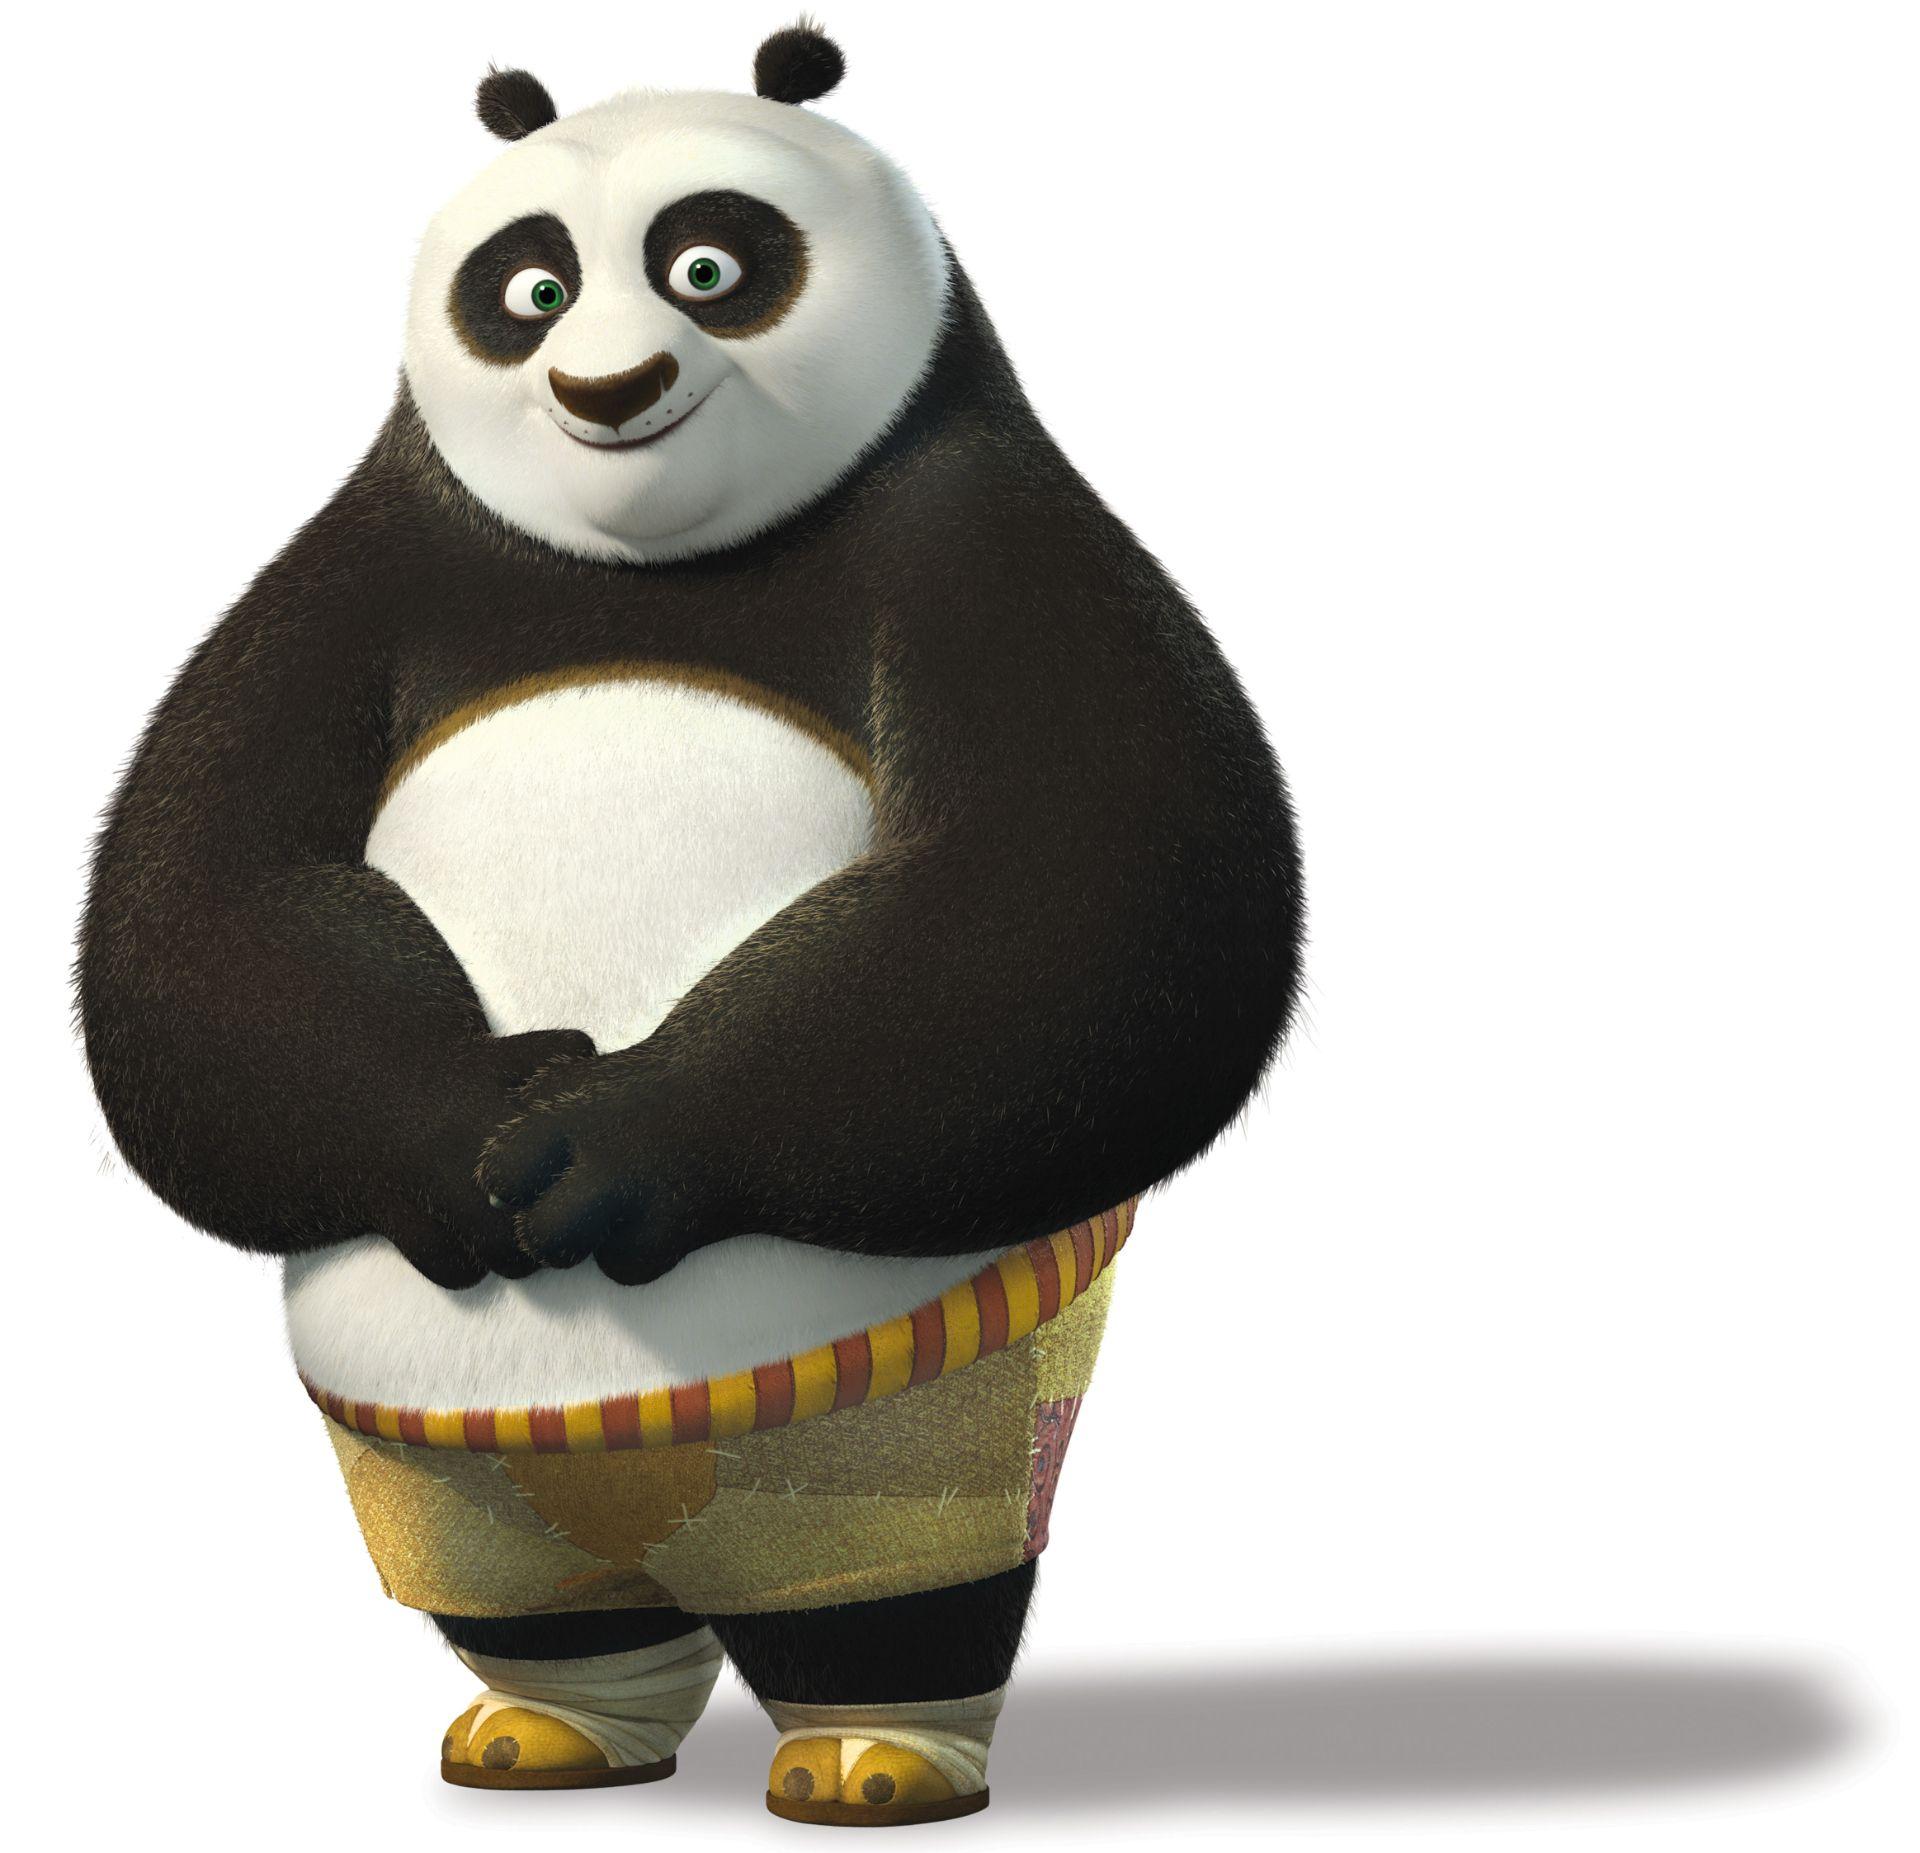 kung fu panda c utare google tattoo 39 s pinterest kung fu panda kung fu y ilustraci n digital. Black Bedroom Furniture Sets. Home Design Ideas